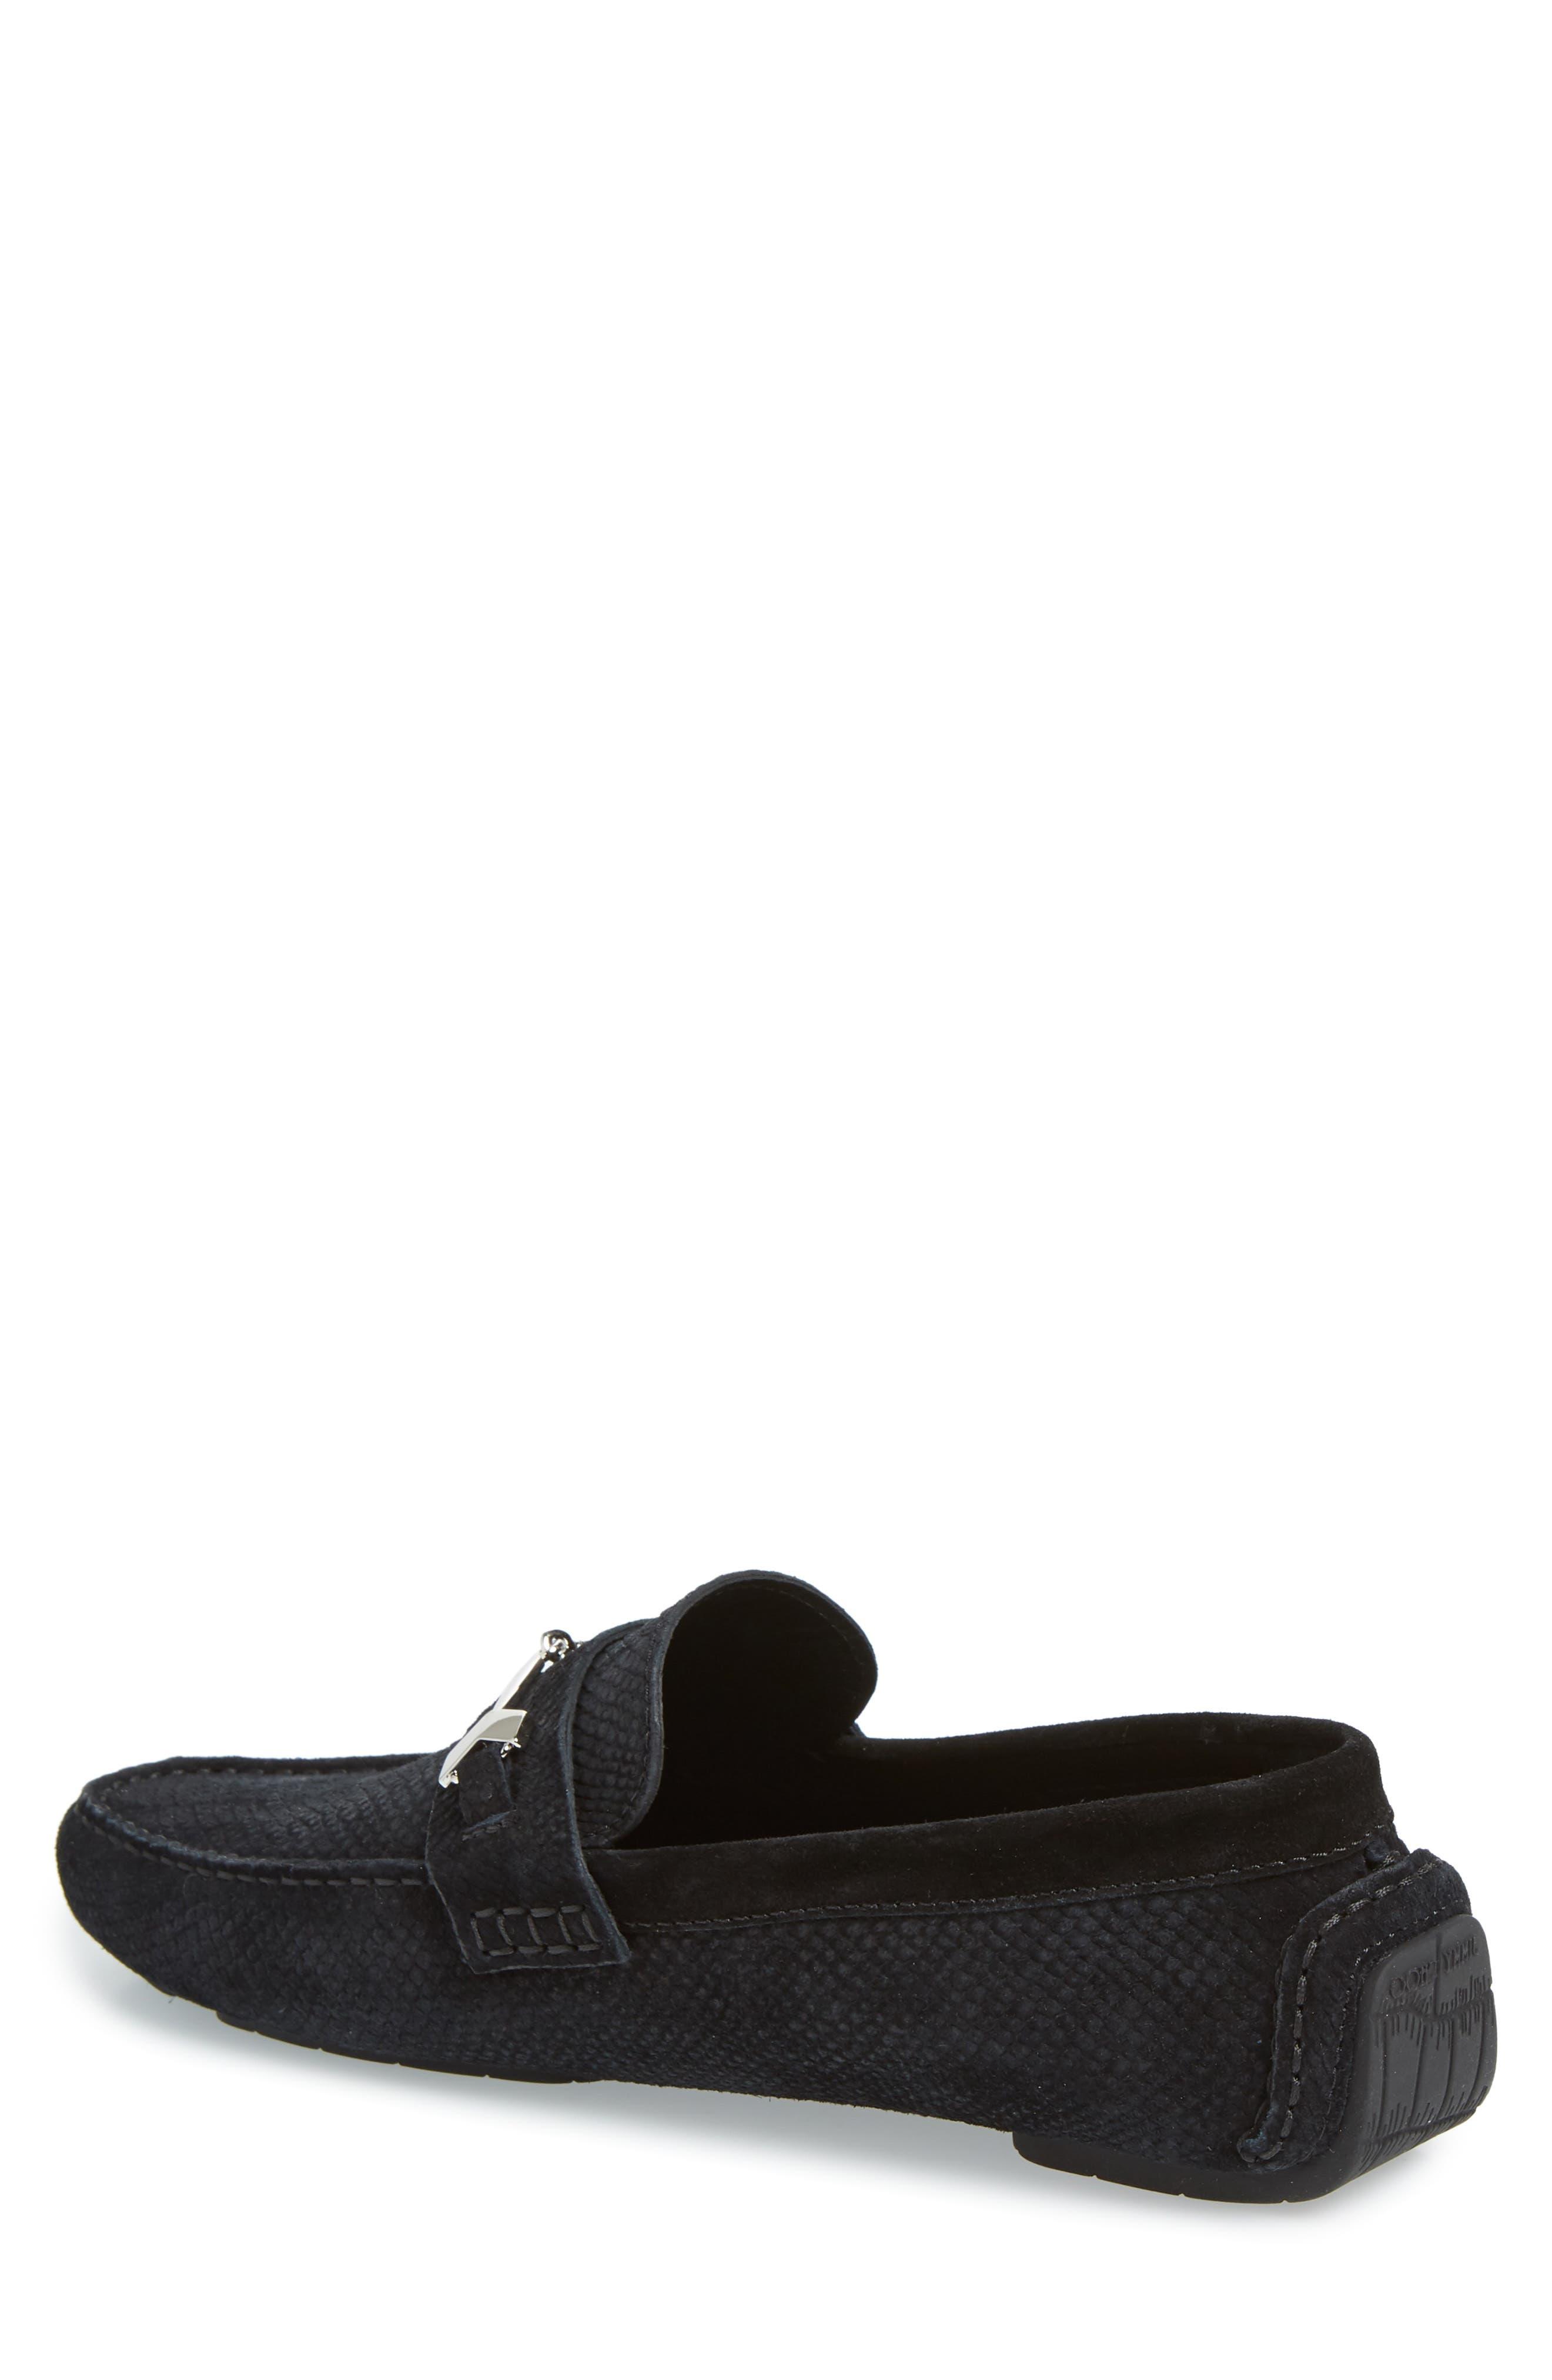 Brewer Croc Textured Driving Loafer,                             Alternate thumbnail 2, color,                             BLACK/BLACK